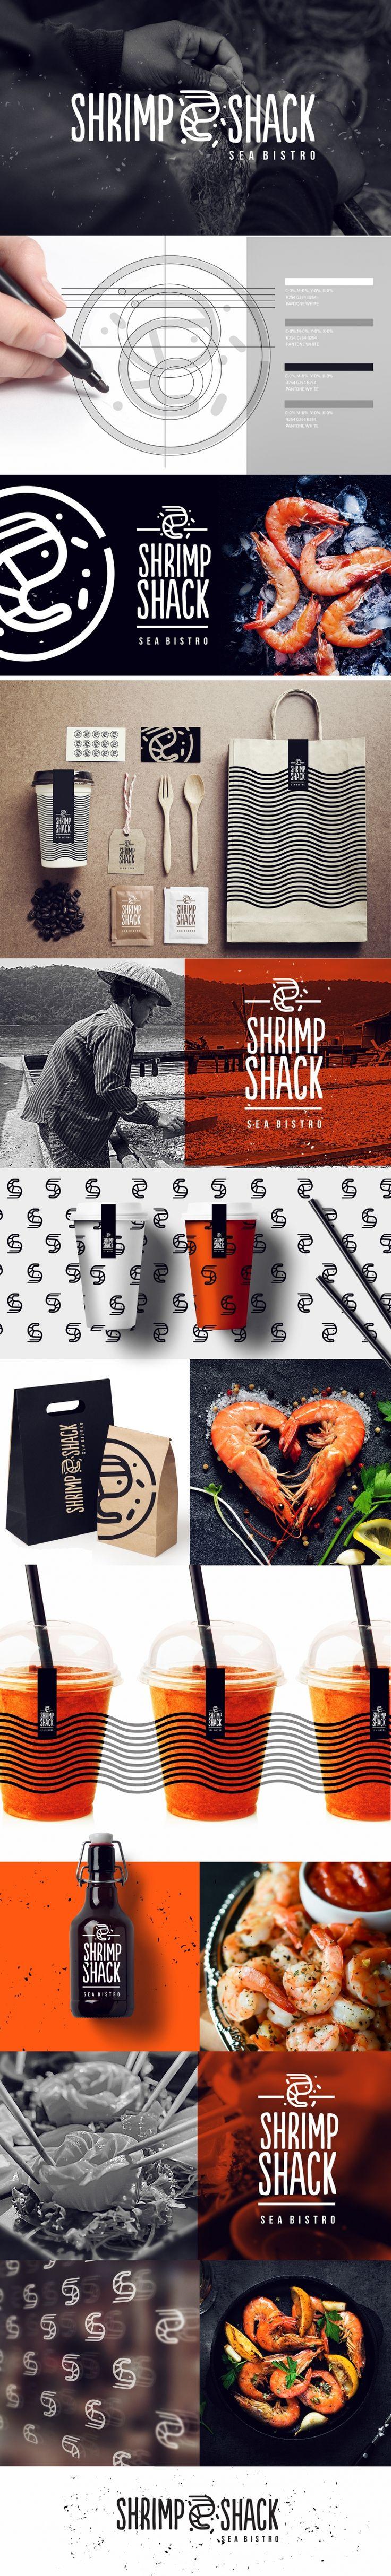 Shrimp Shack Bistro Branding by Zuzanna Sadlik | Fivestar Branding Agency – Design and Branding Agency & Curated Inspiration Gallery #restaurant #restaurantbranding #restaurantdesign #branding #brand #brandinginspiration #branddesign #package #packaging #foodpackaging #design #behance #pinterest #dribbble #fivestarbranding